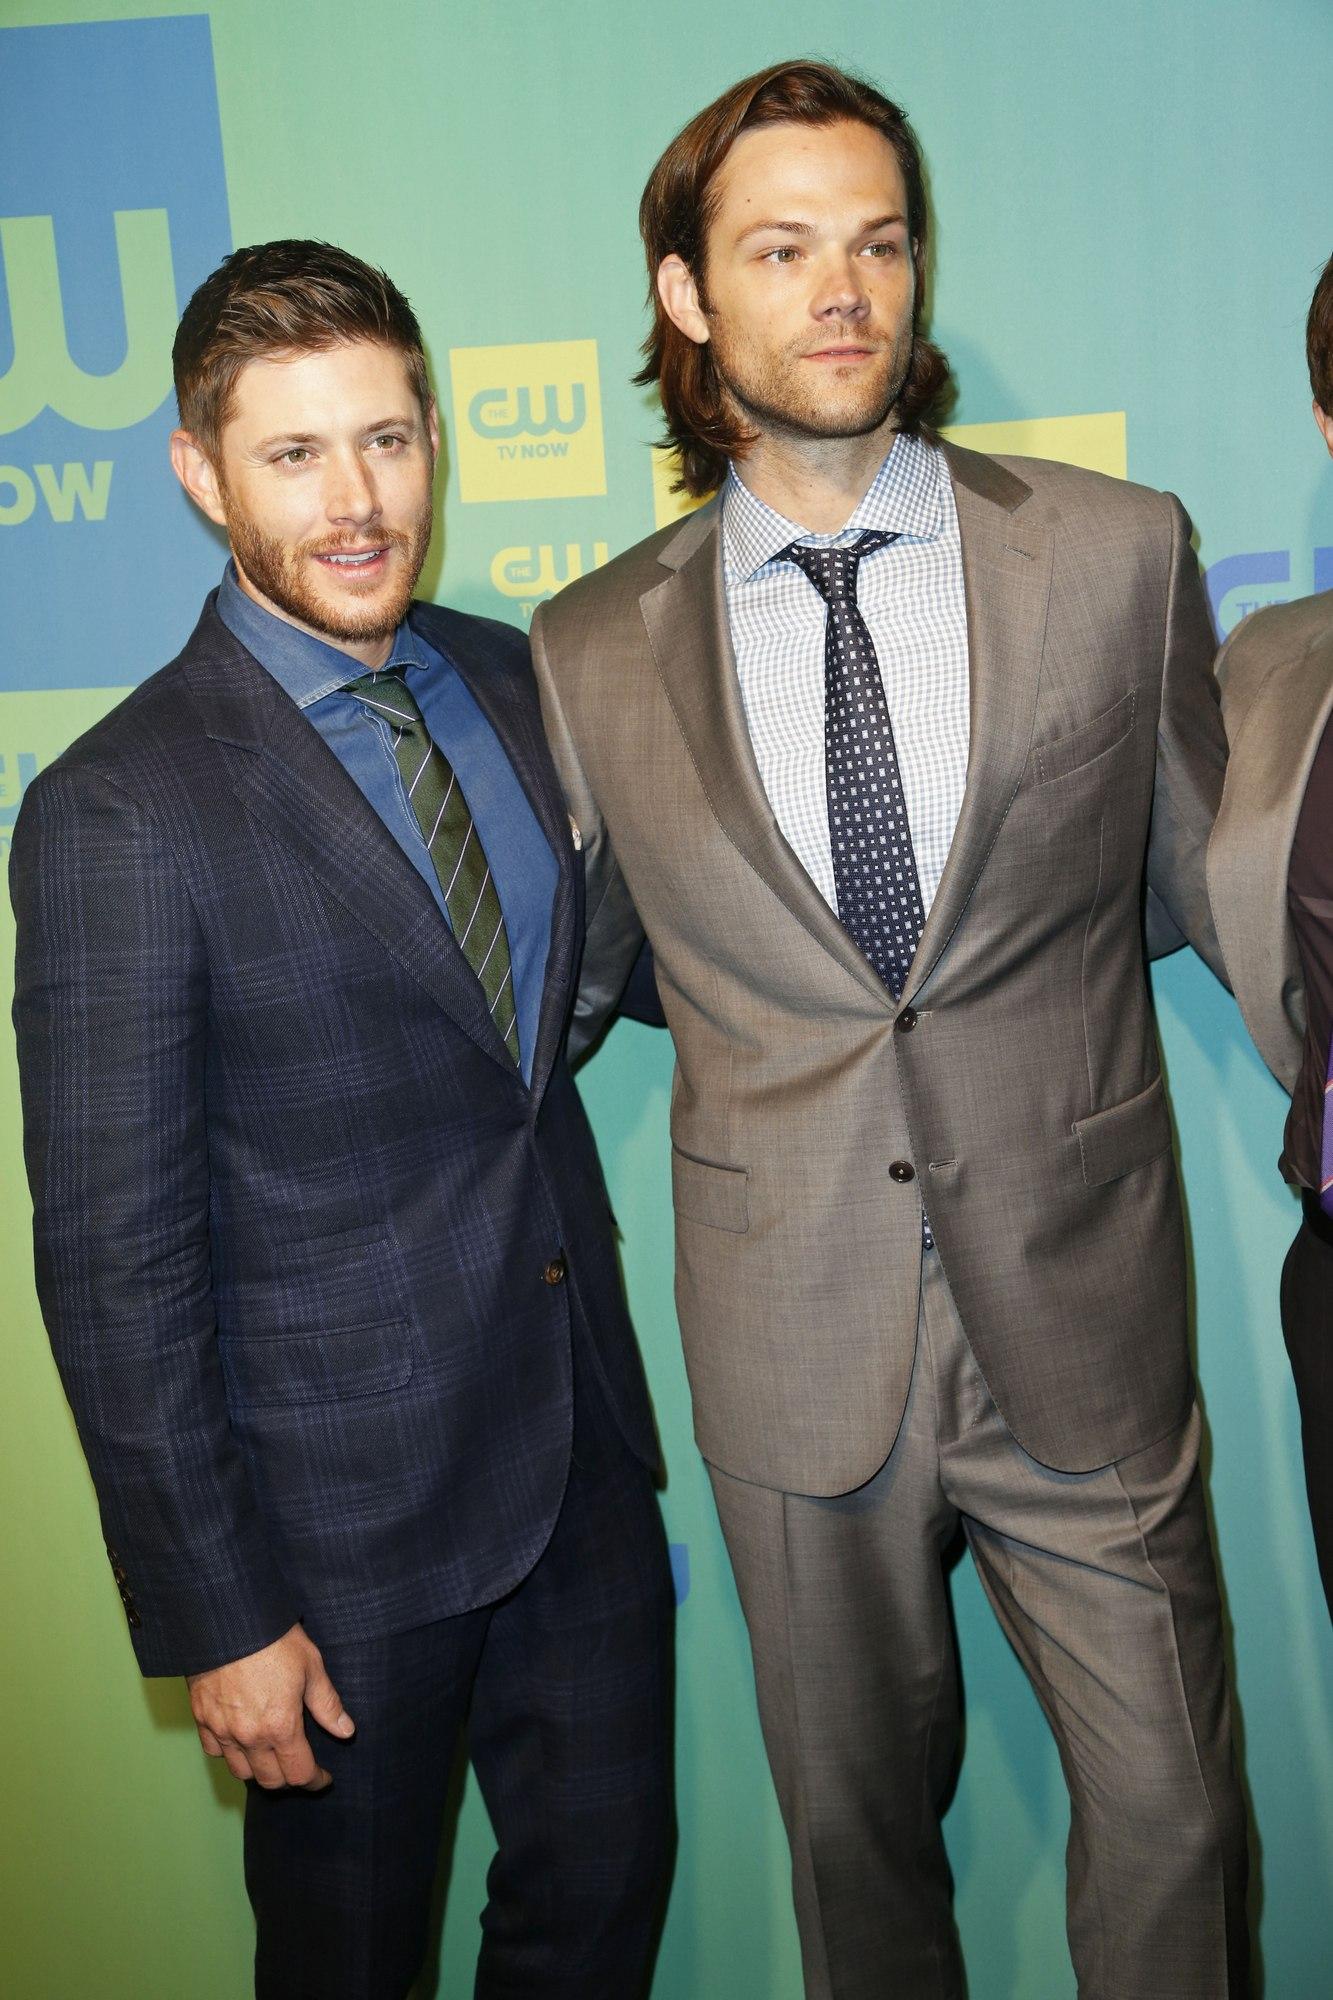 CW Upfronts 2014 - Jared Padalecki Photo (37084047) - Fanpop